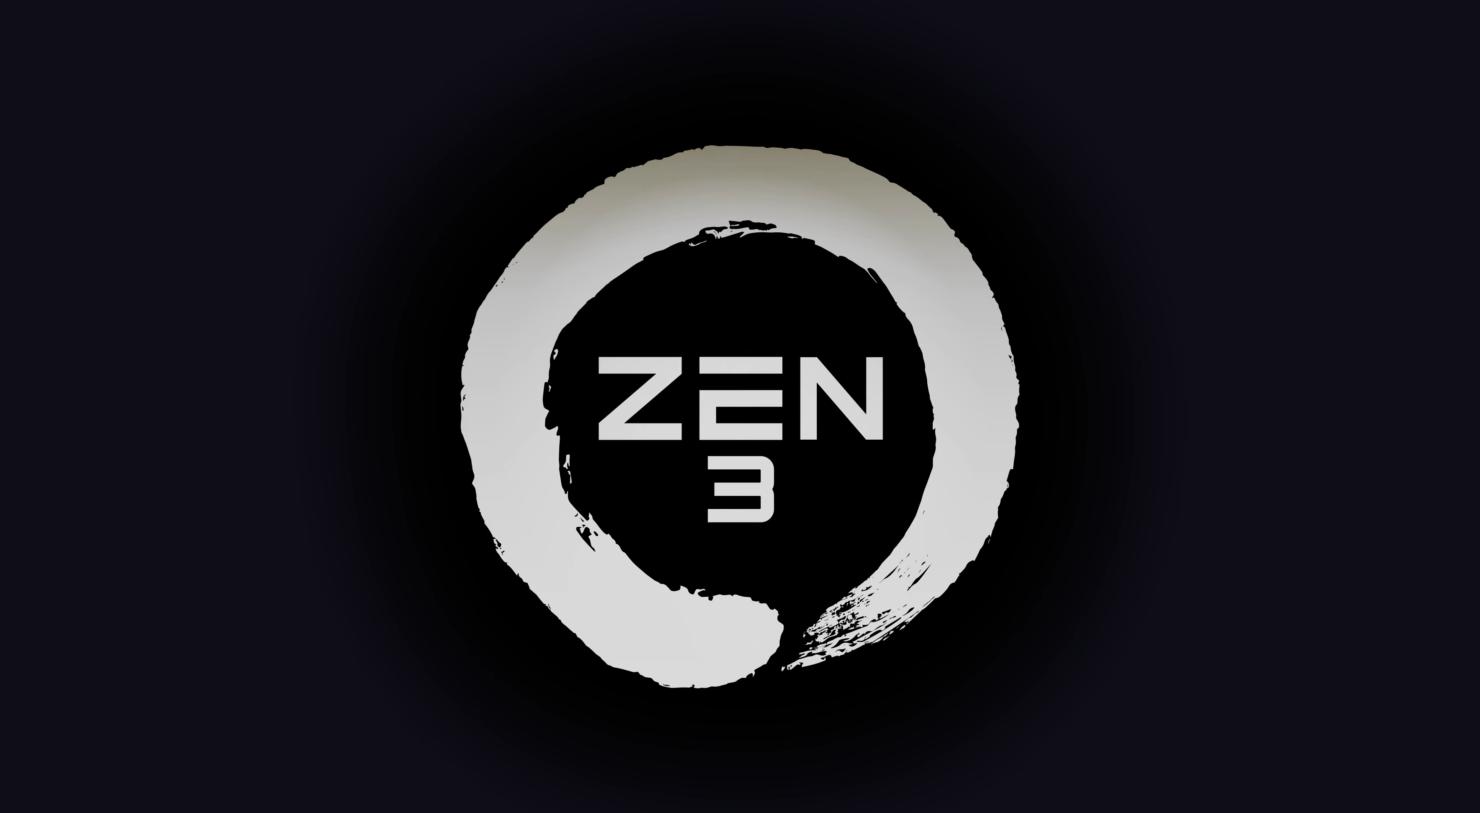 AMD Ryzen 9 4950X AM4 Desktop CPU With 16 Zen 3 Cores Has Been Spotted With Up To 4.9 GHz Clock Speeds_2